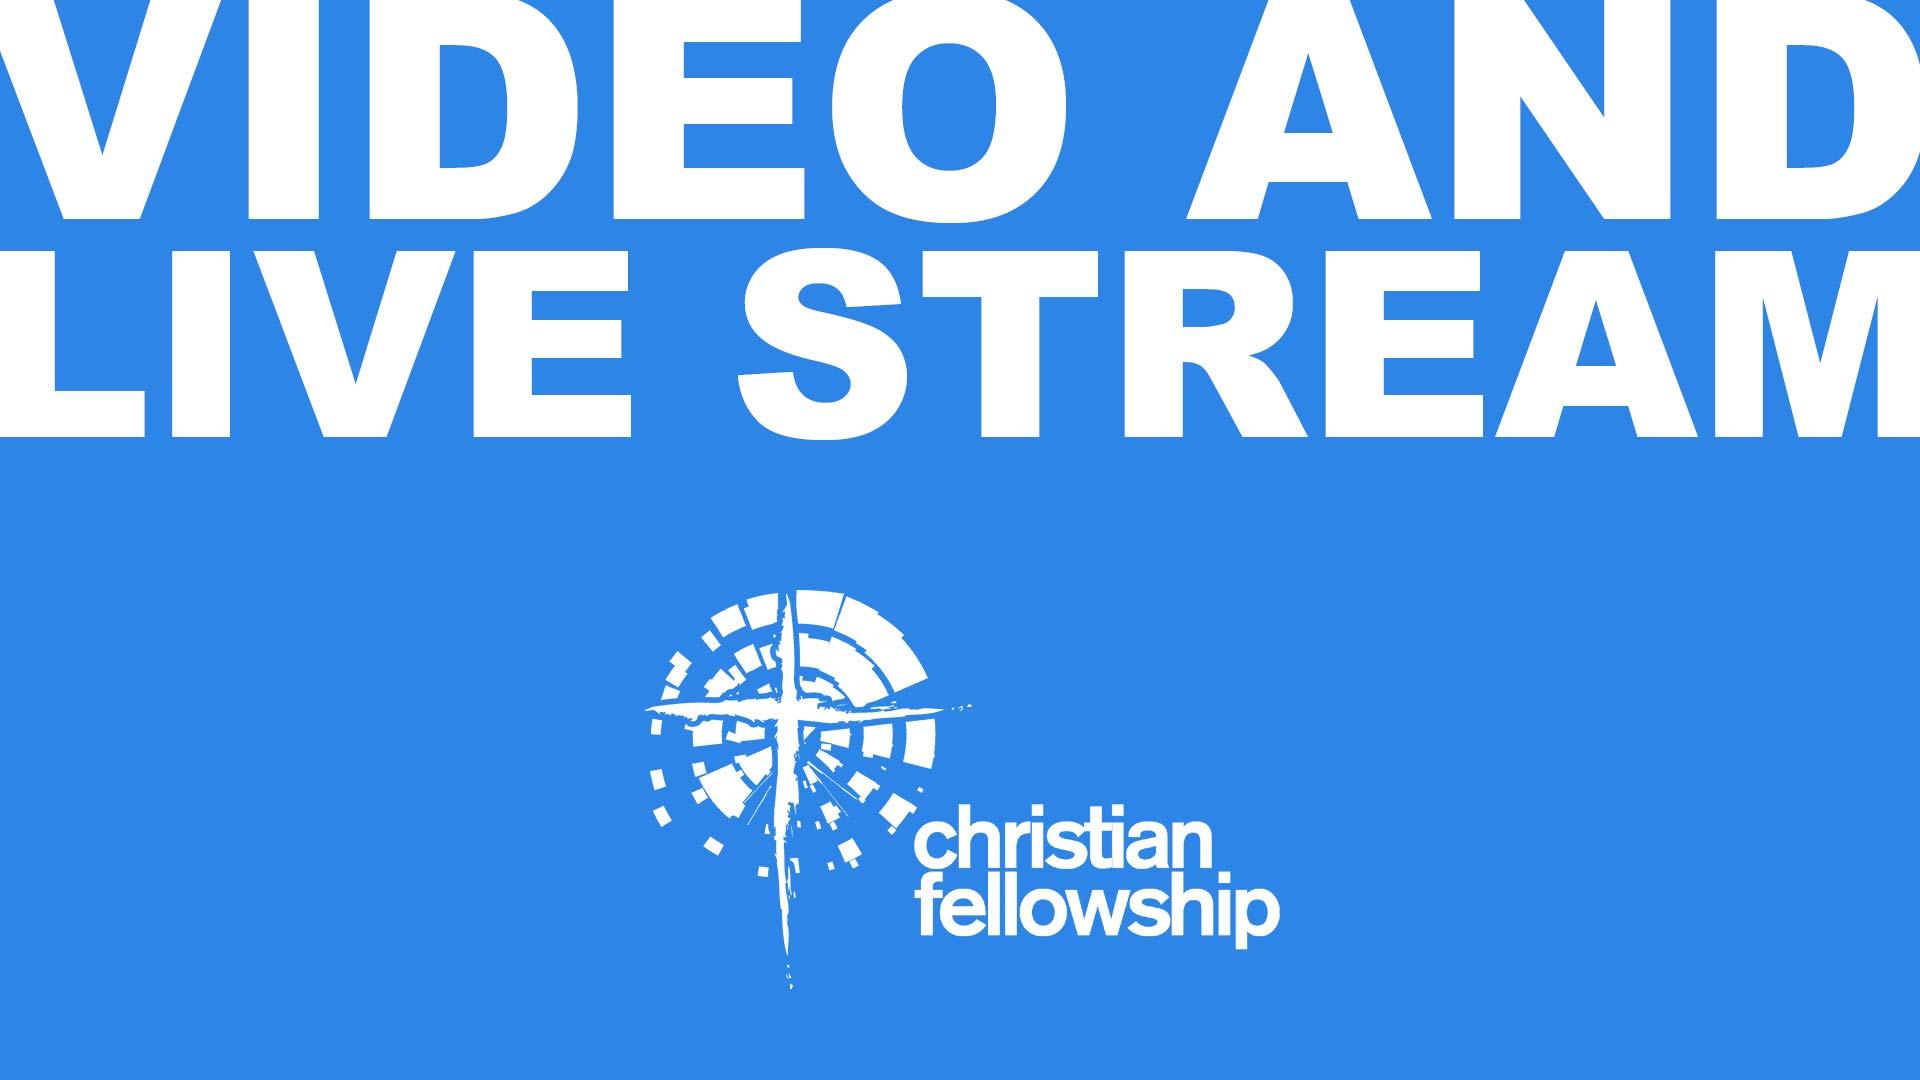 video-live-stream-1920-x-1080